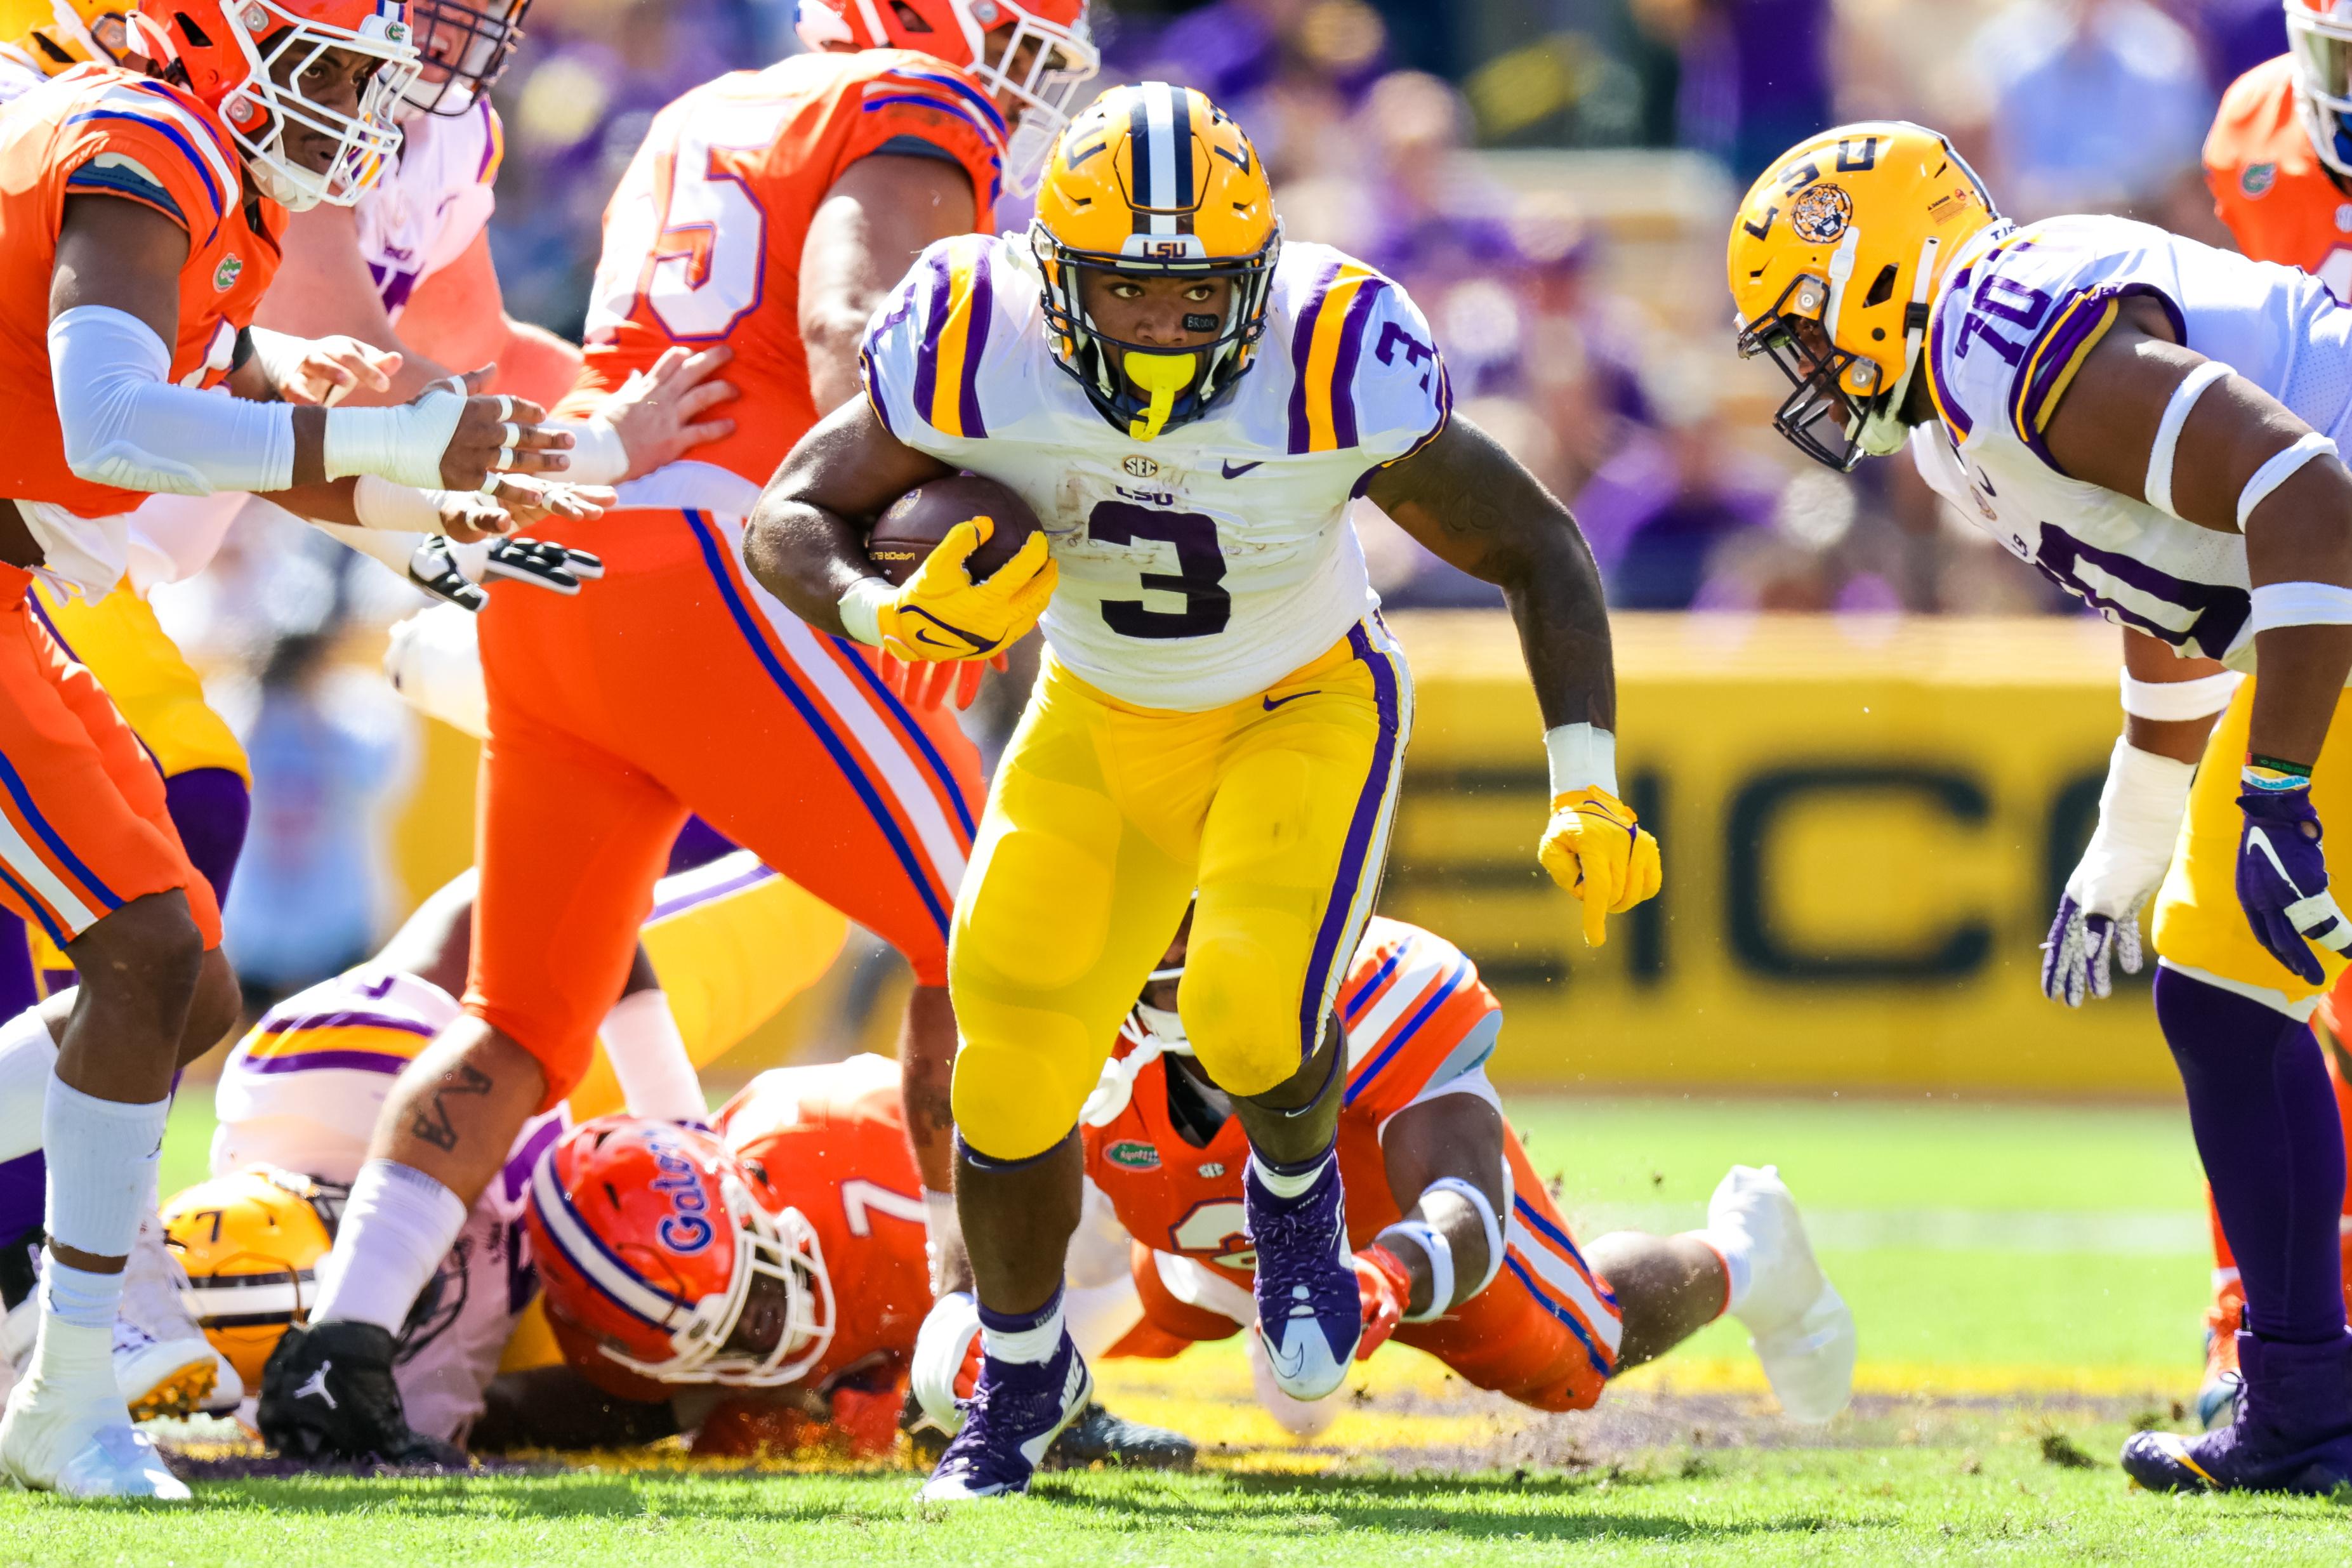 NCAA Football: Florida at Louisiana State